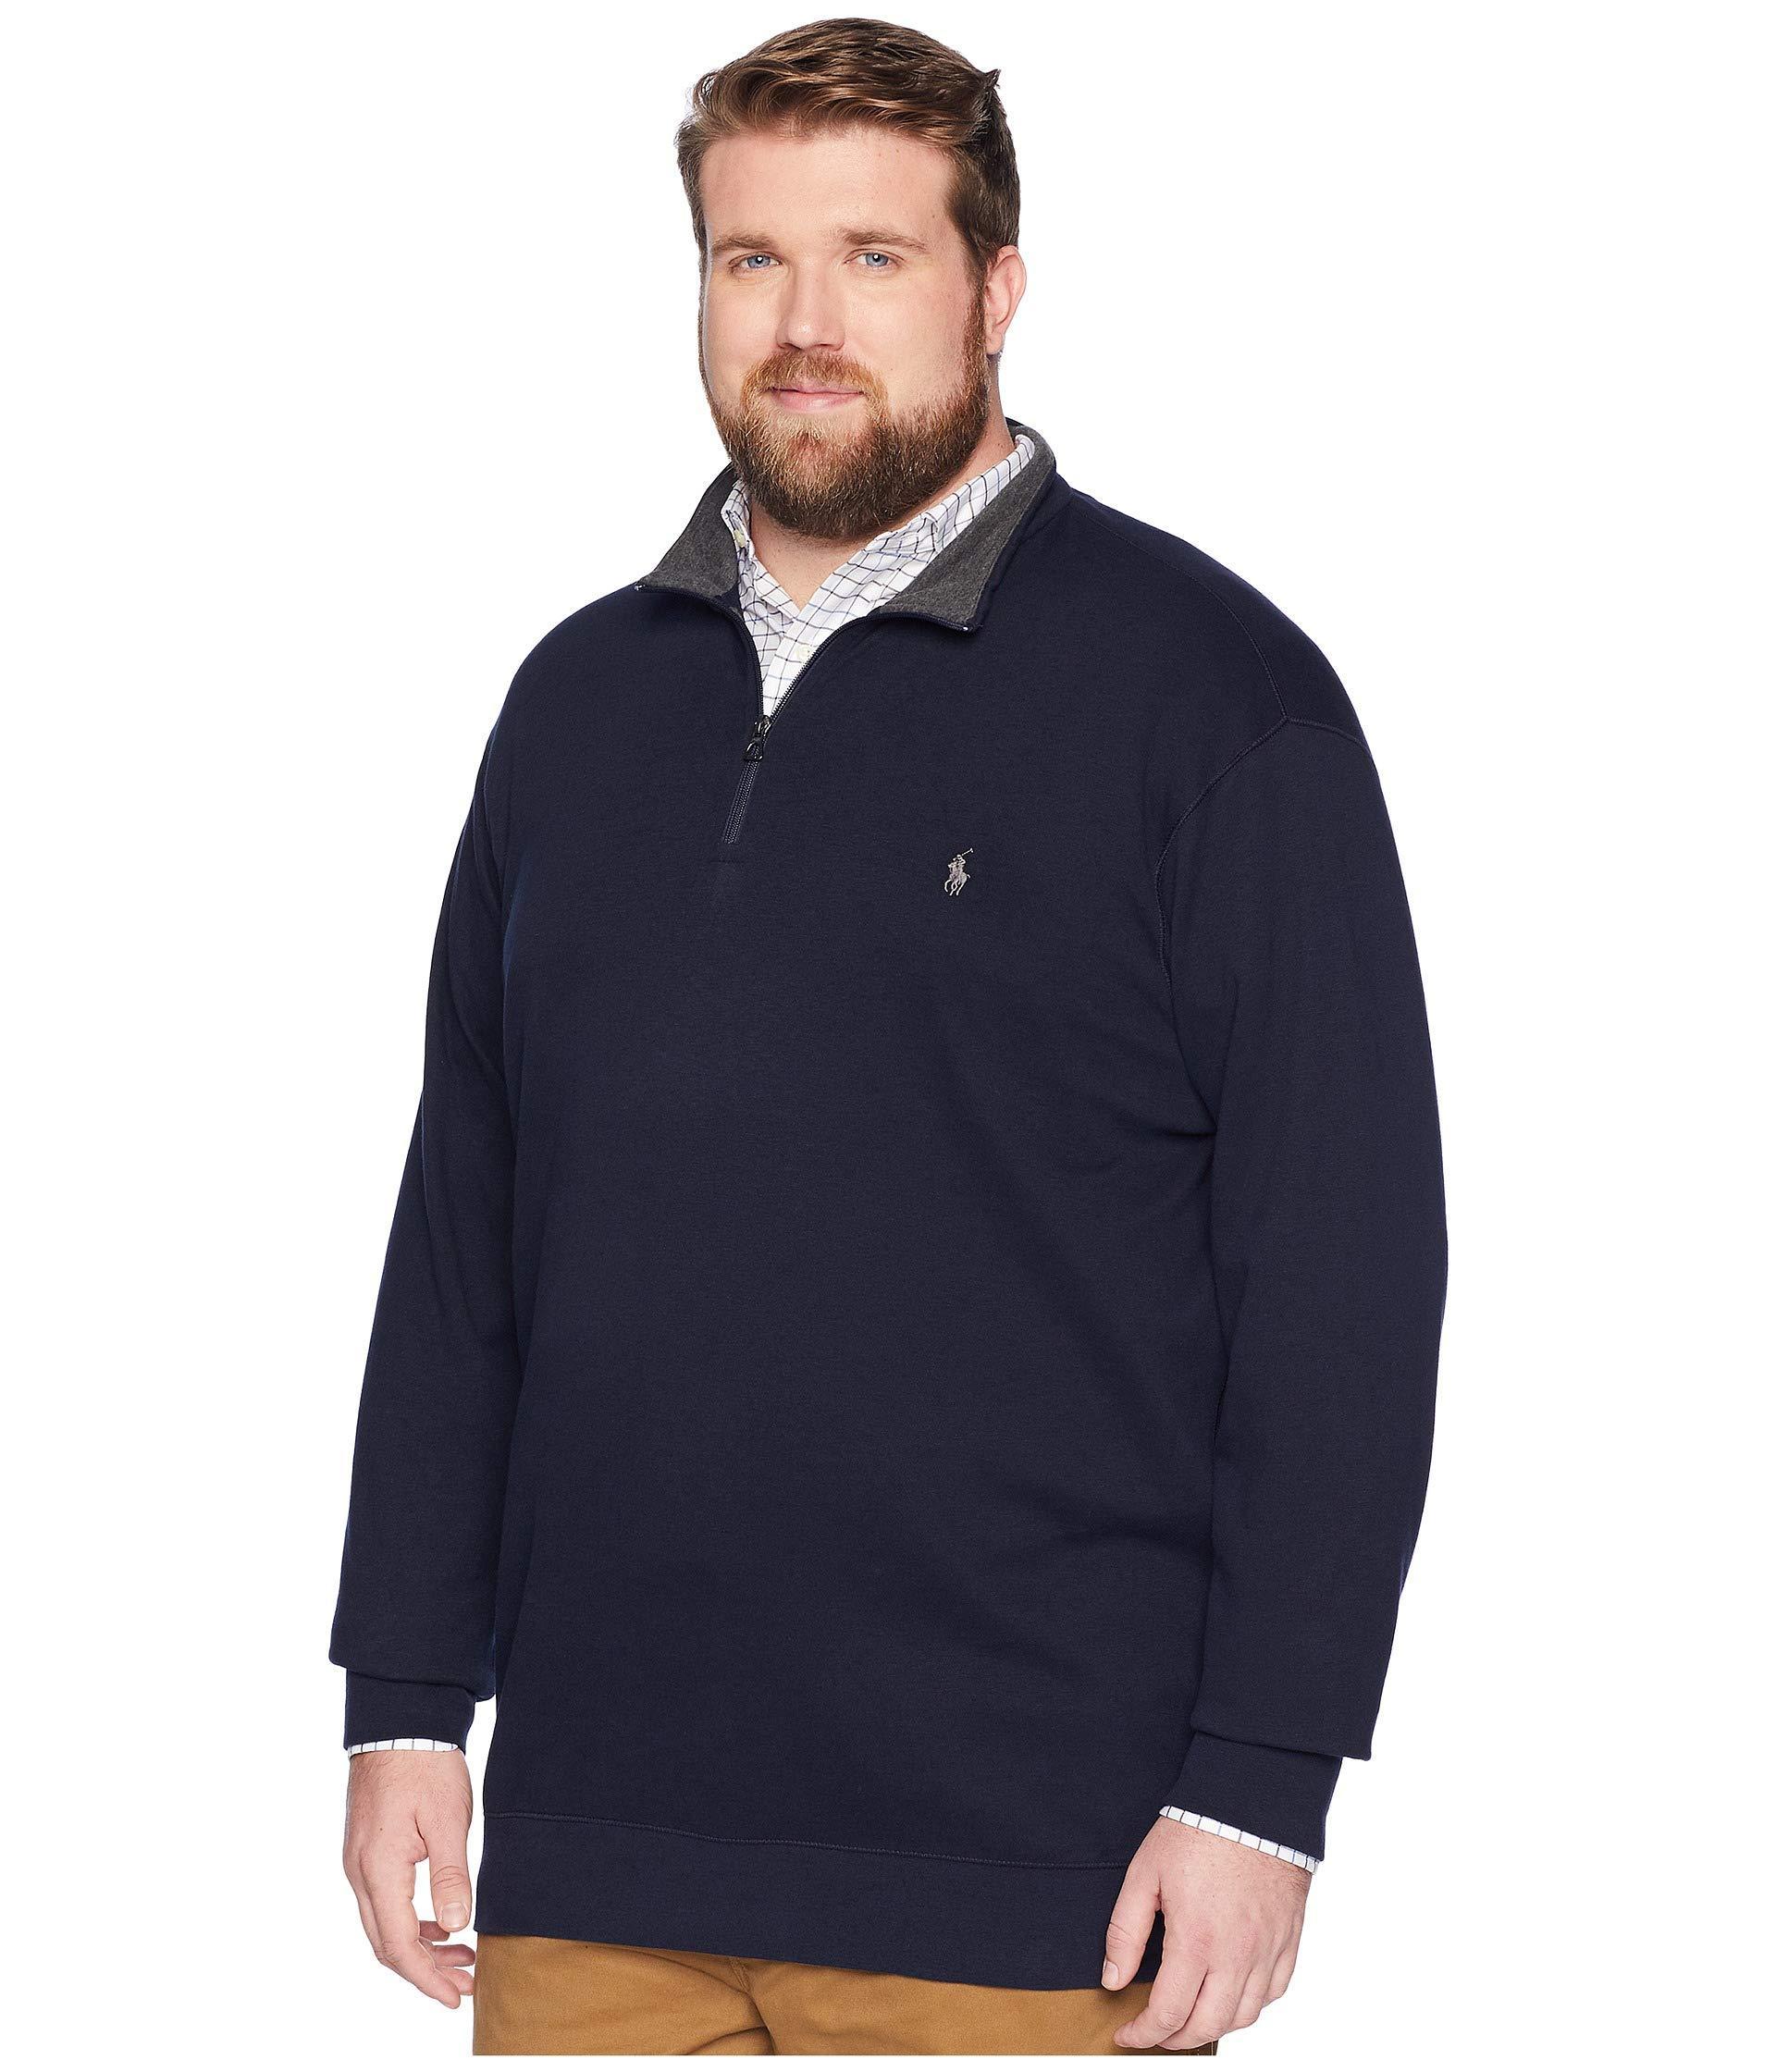 7956d0cb8ed73 Lyst - Polo Ralph Lauren Big   Tall Luxury Jersey 1 2 Zip in Blue for Men